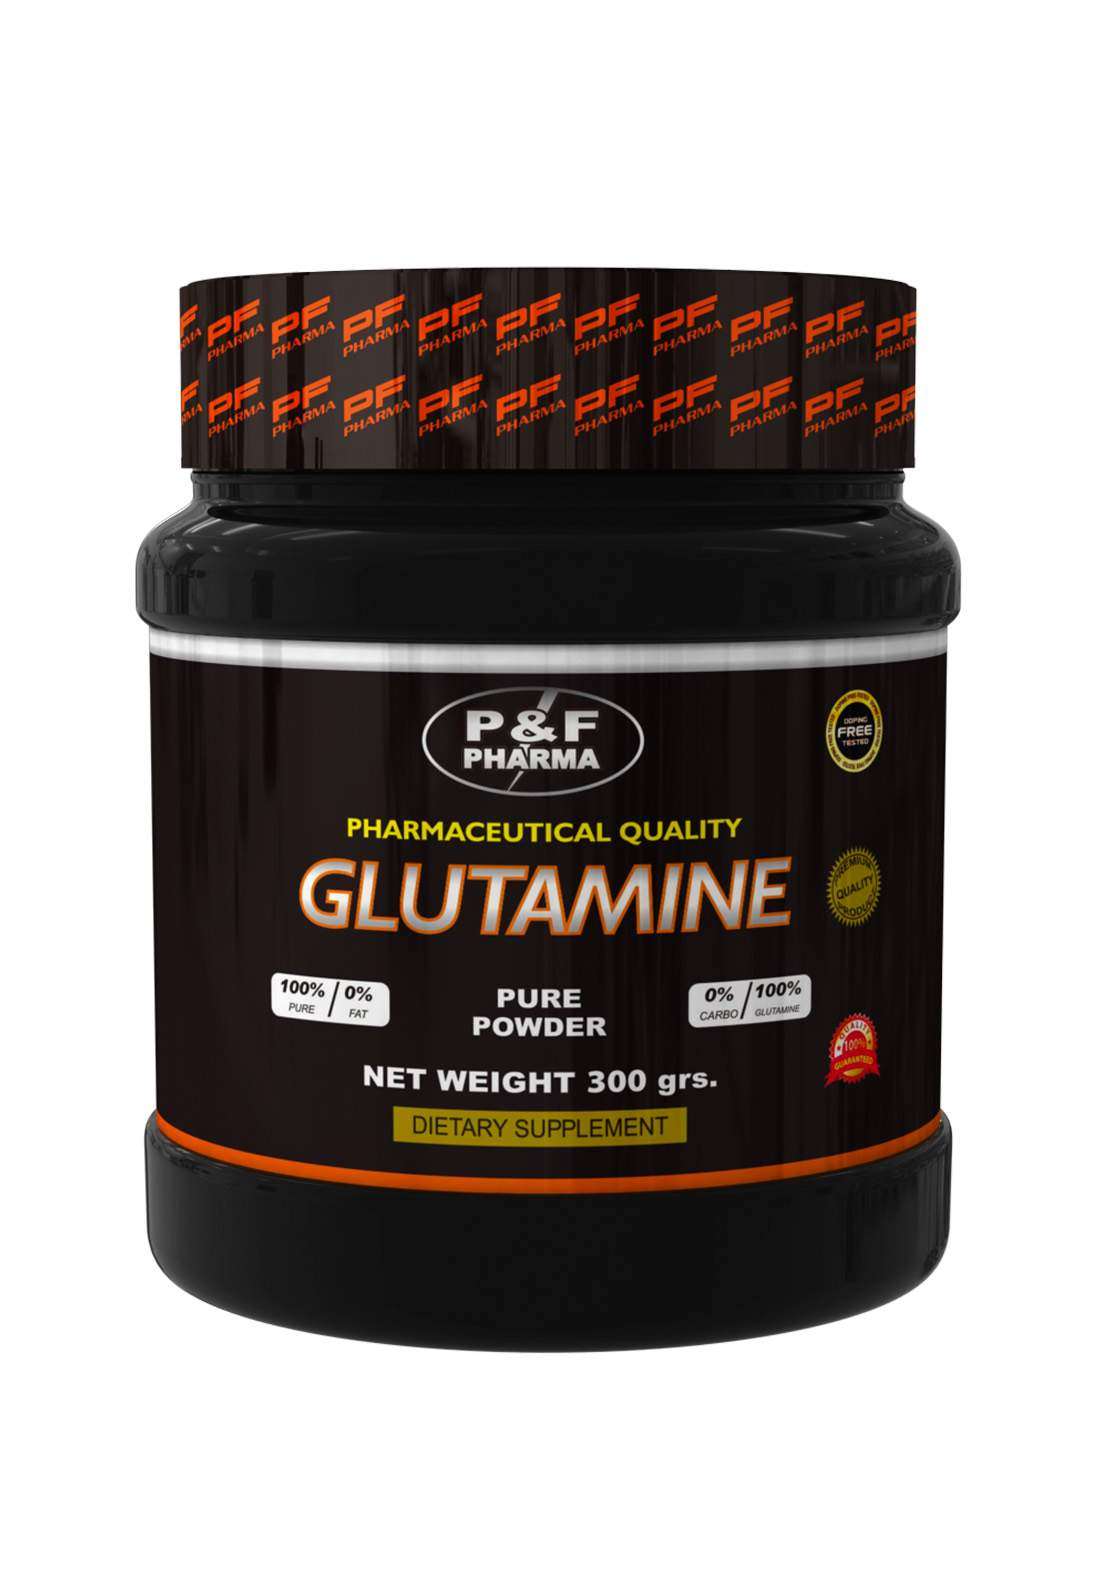 P&F Pharma  Glutamine Pure powder- 300gm مكمل غذائي